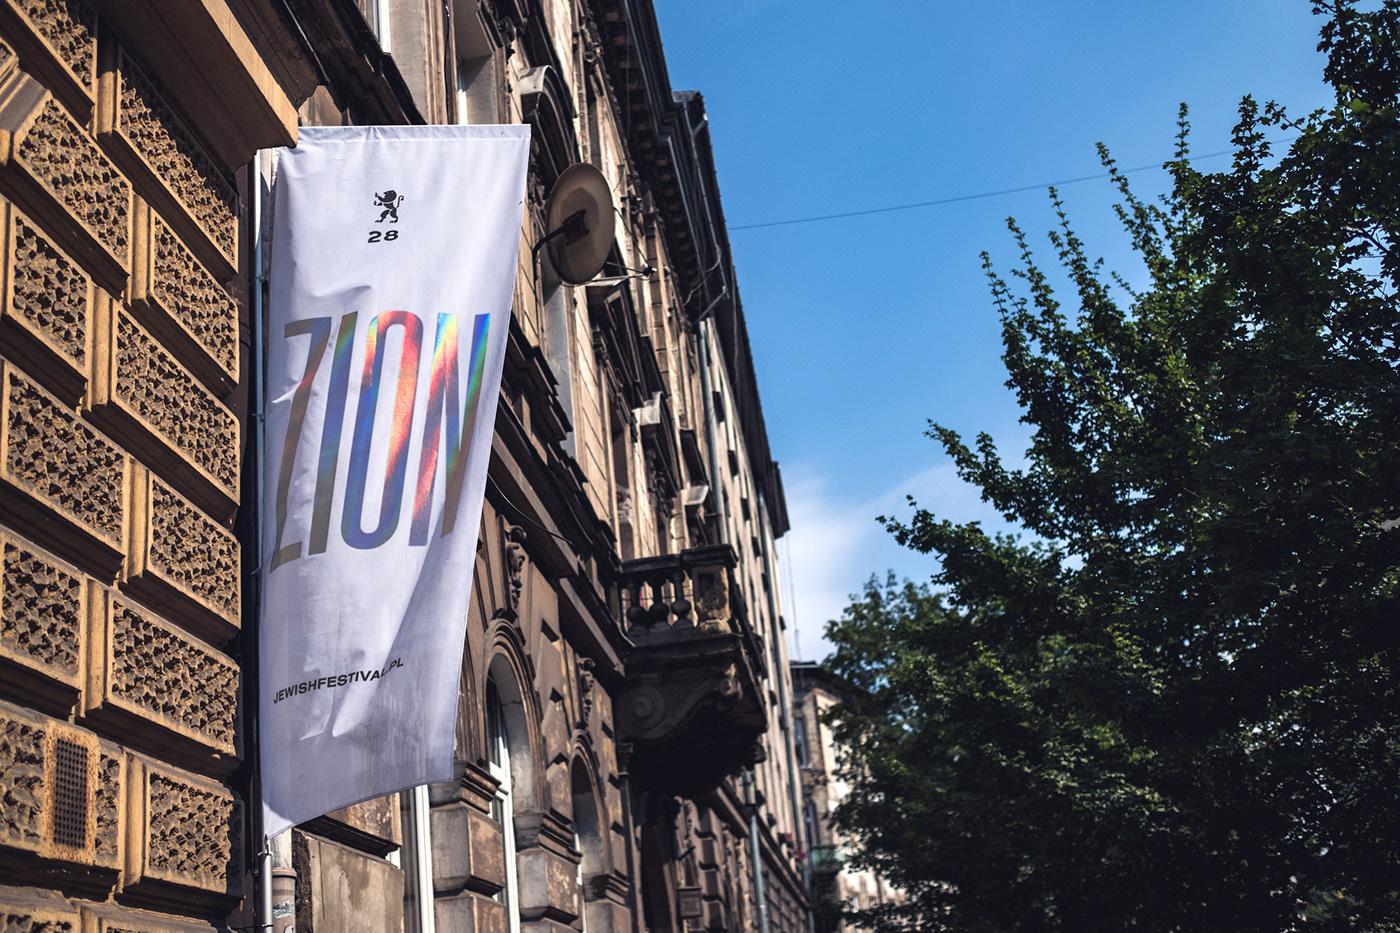 Krakow's Jewish Culture Festival Branding by Studio Otwarte